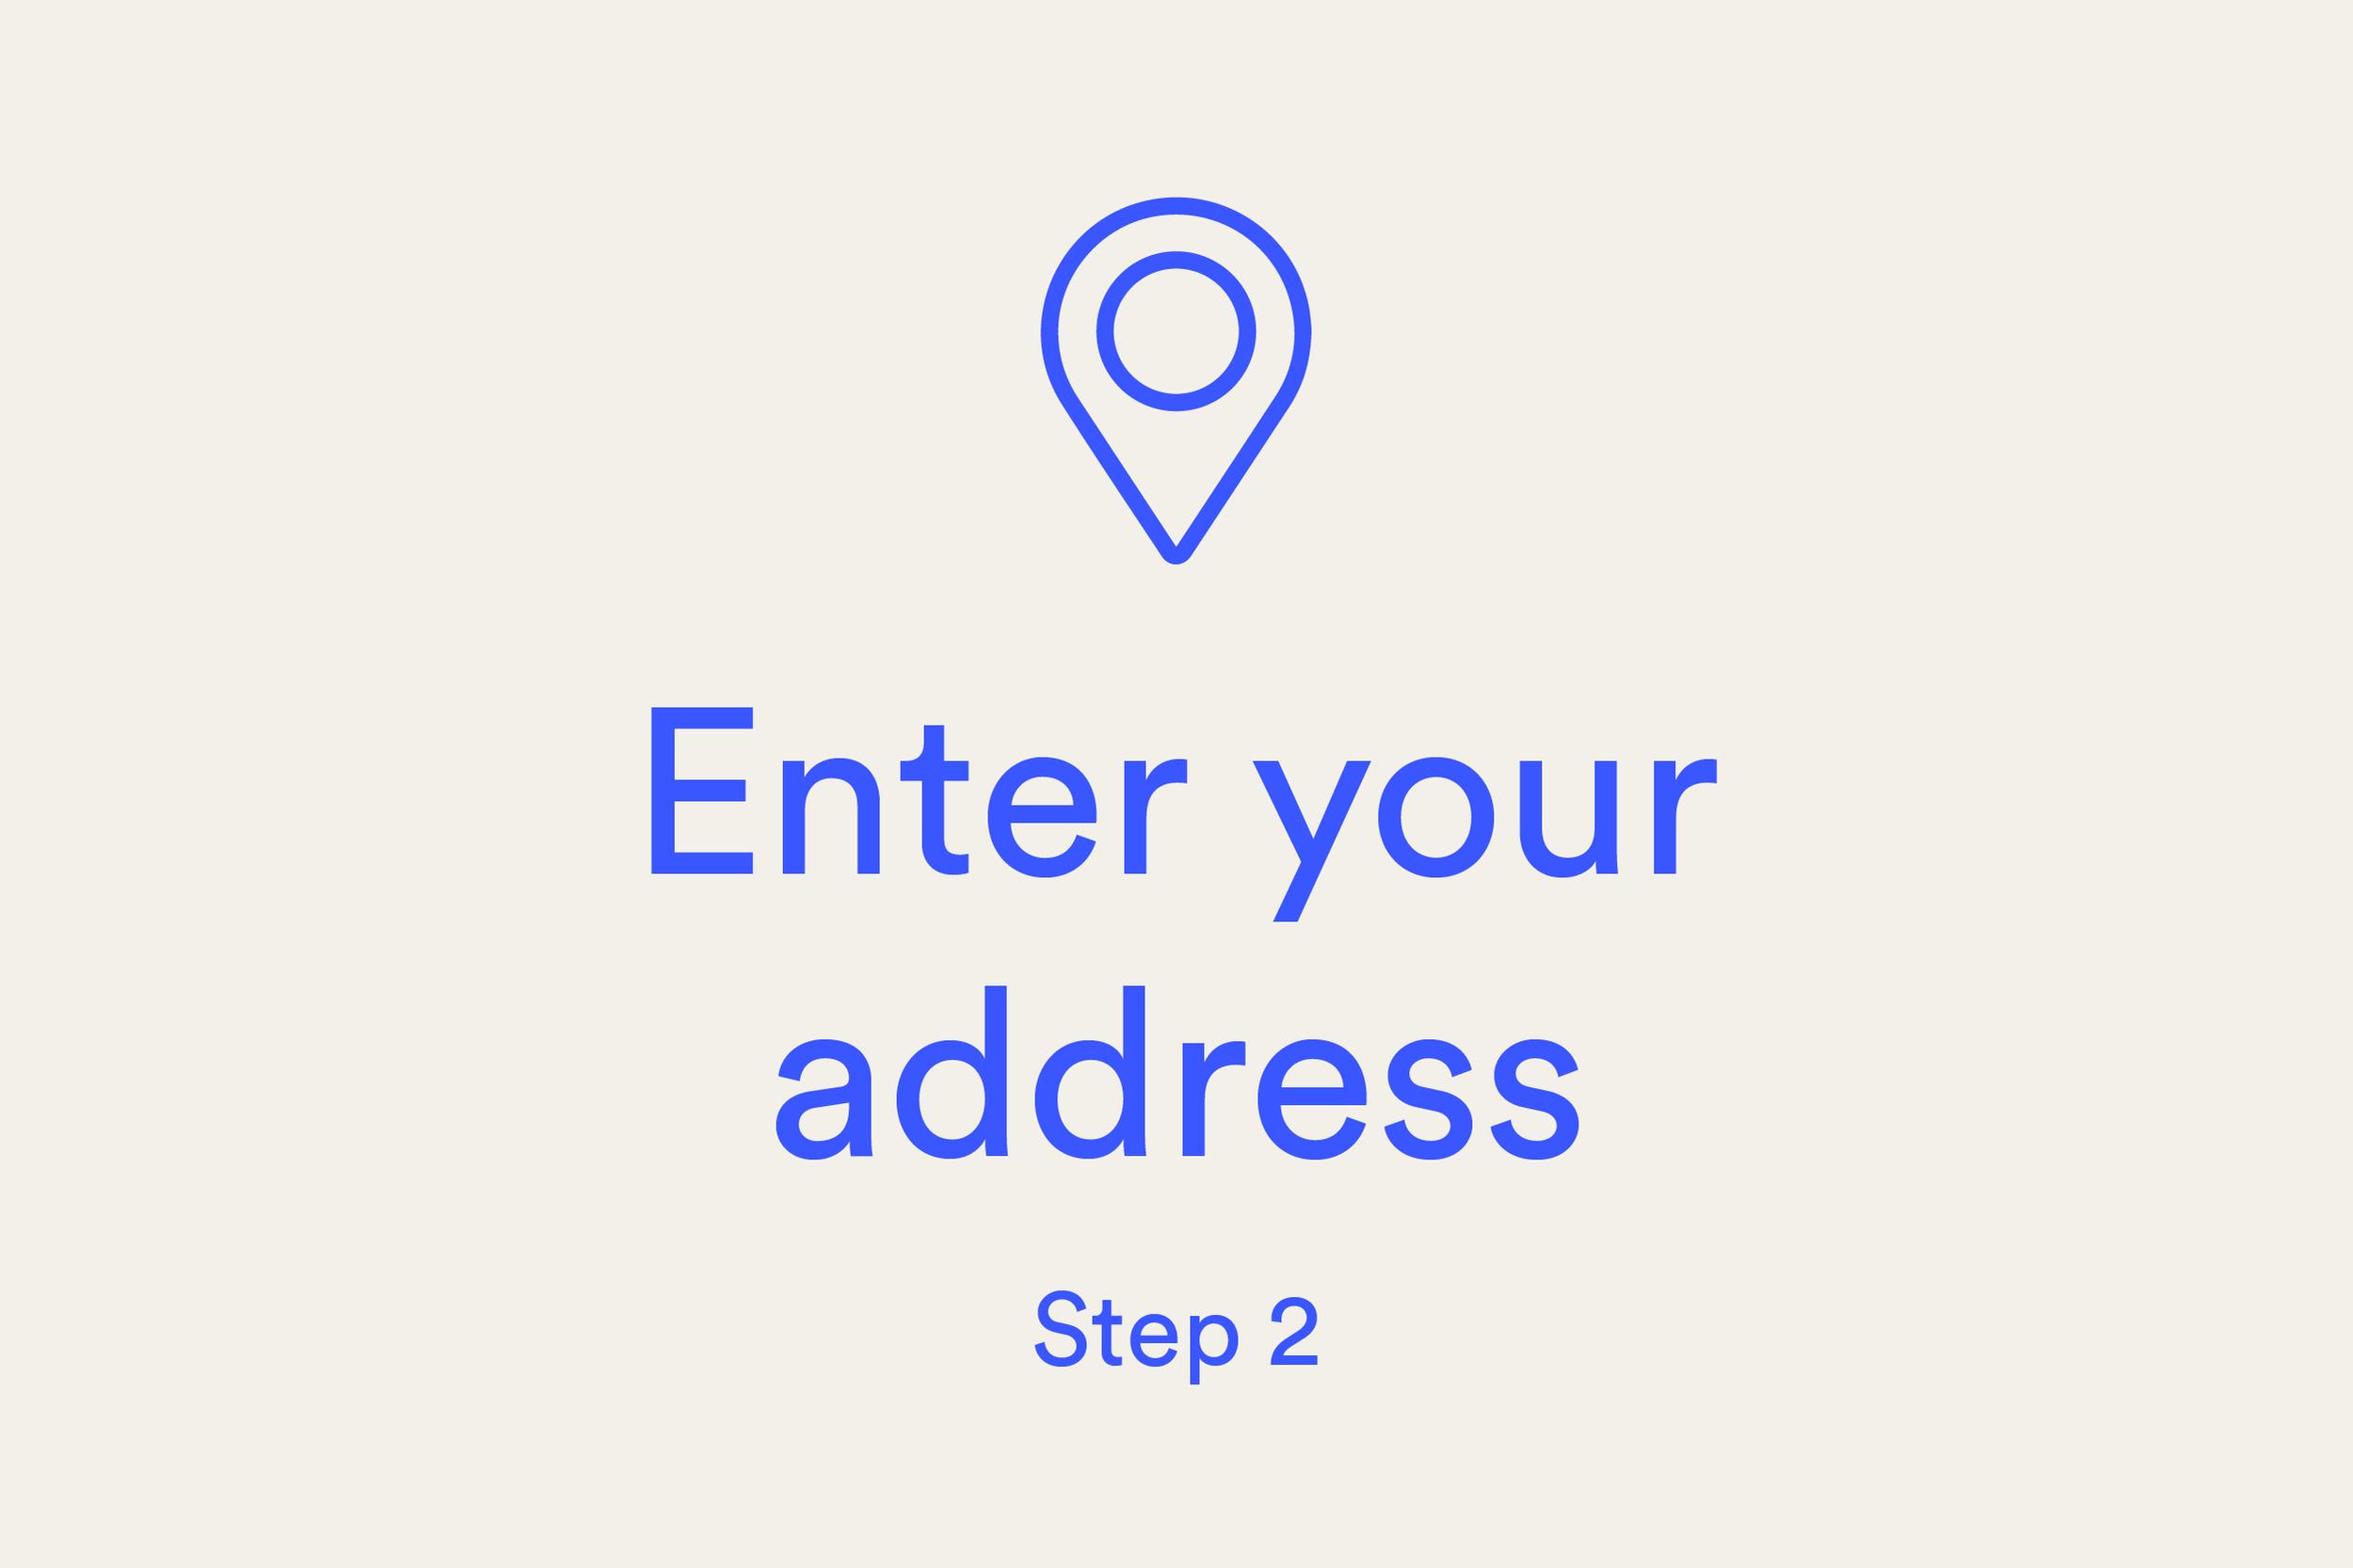 Enter your address (Step 2)